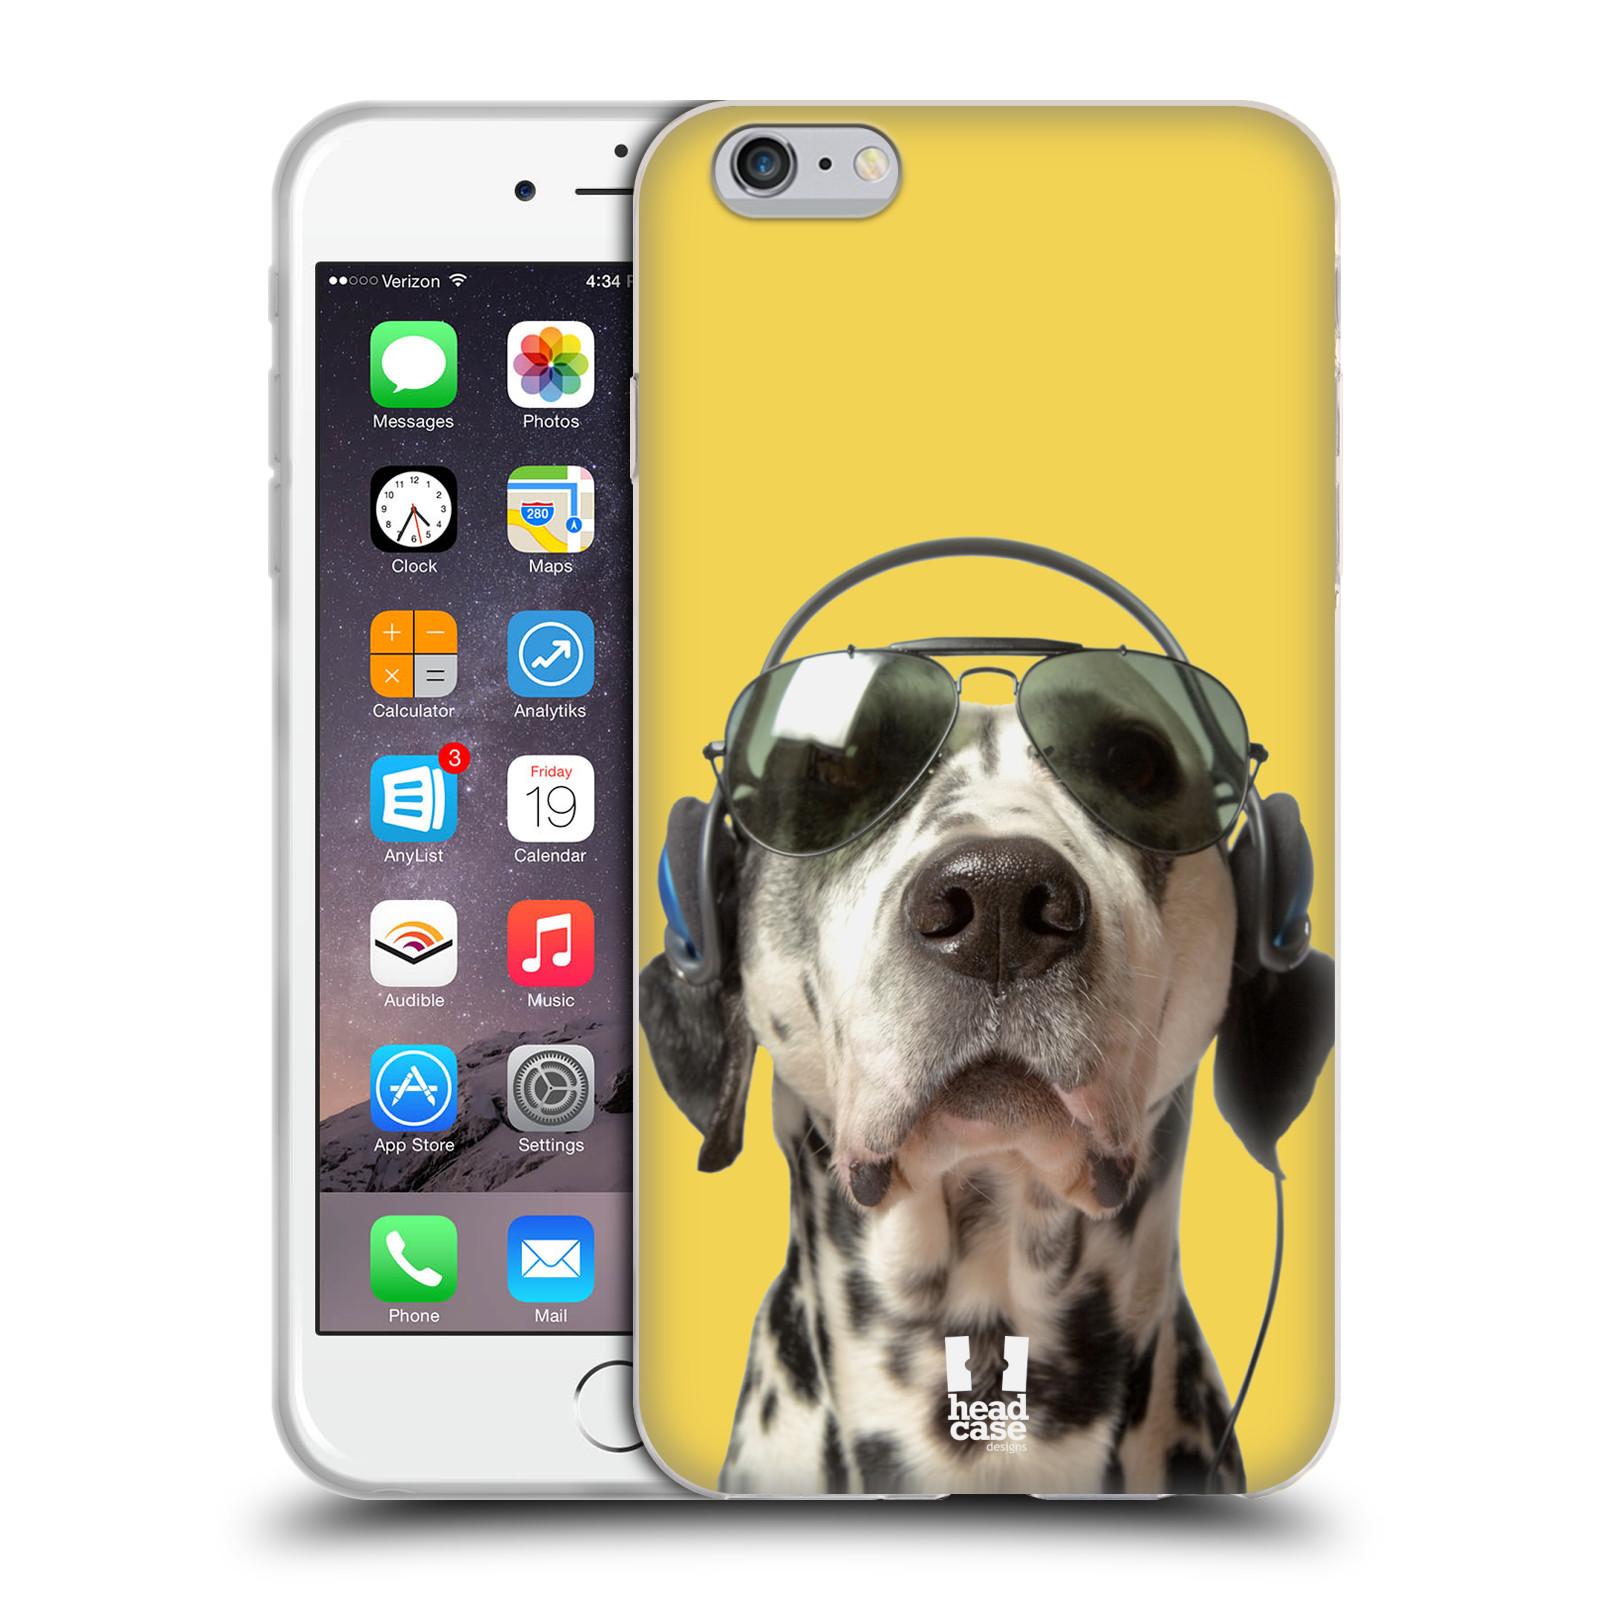 HEAD CASE silikonový obal na mobil Apple Iphone 6 PLUS/ 6S PLUS vzor Legrační zvířátka dalmatin se sluchátky žlutá